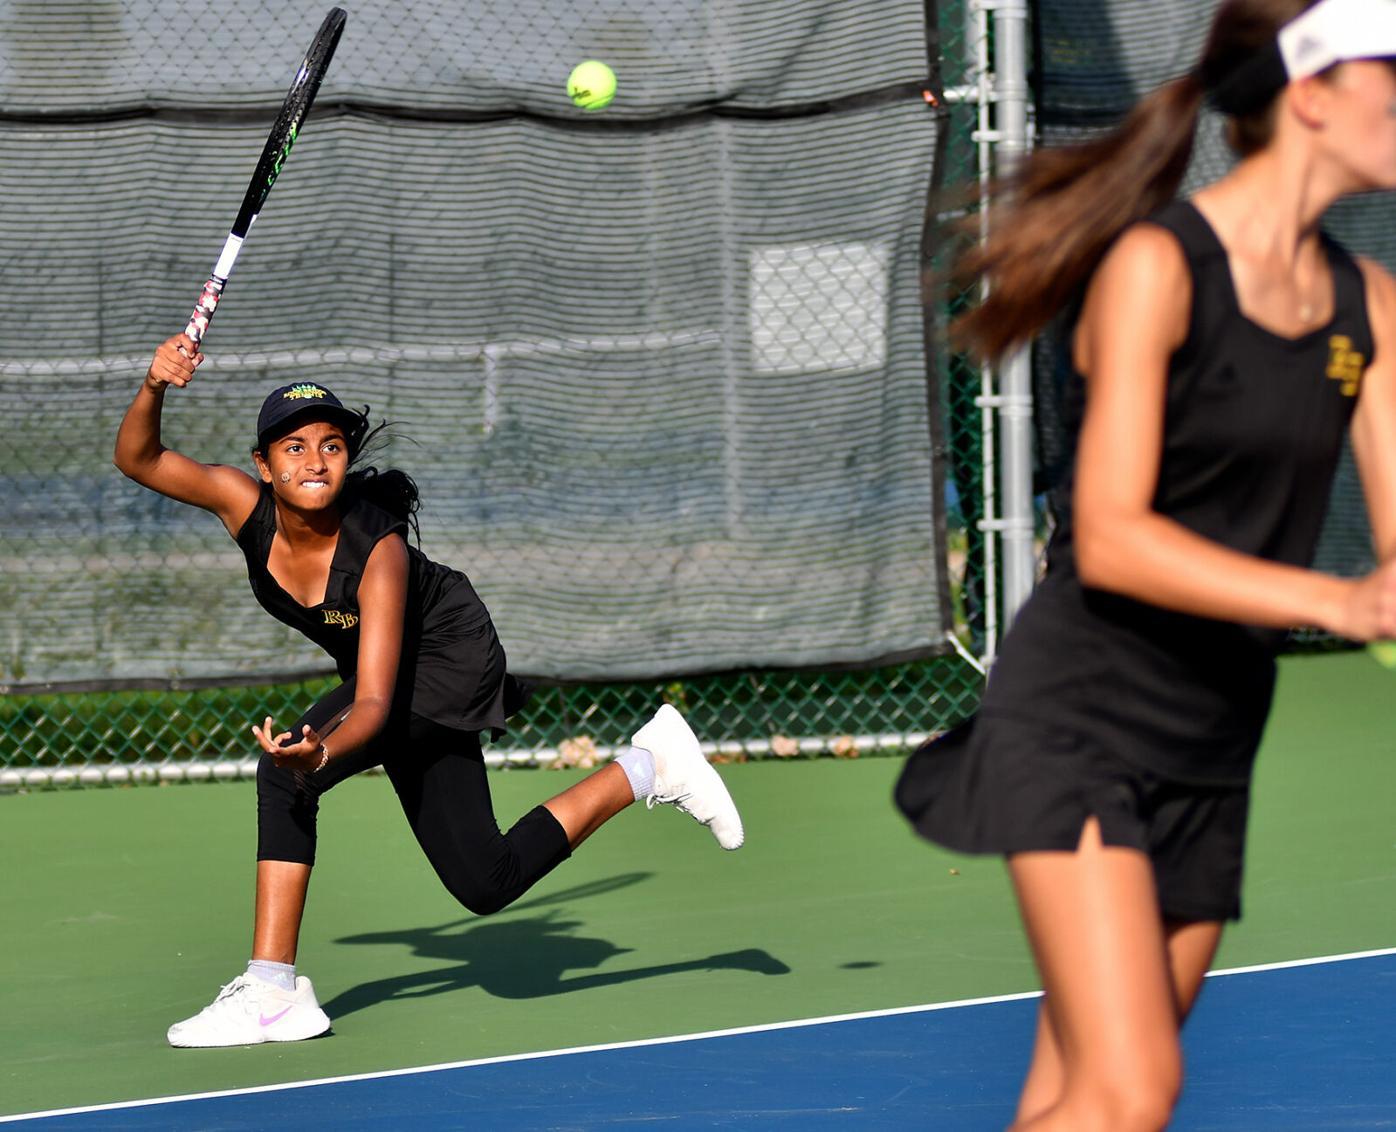 Rock Bridge tennis player Prathyankara Premkumar swings through her forehand